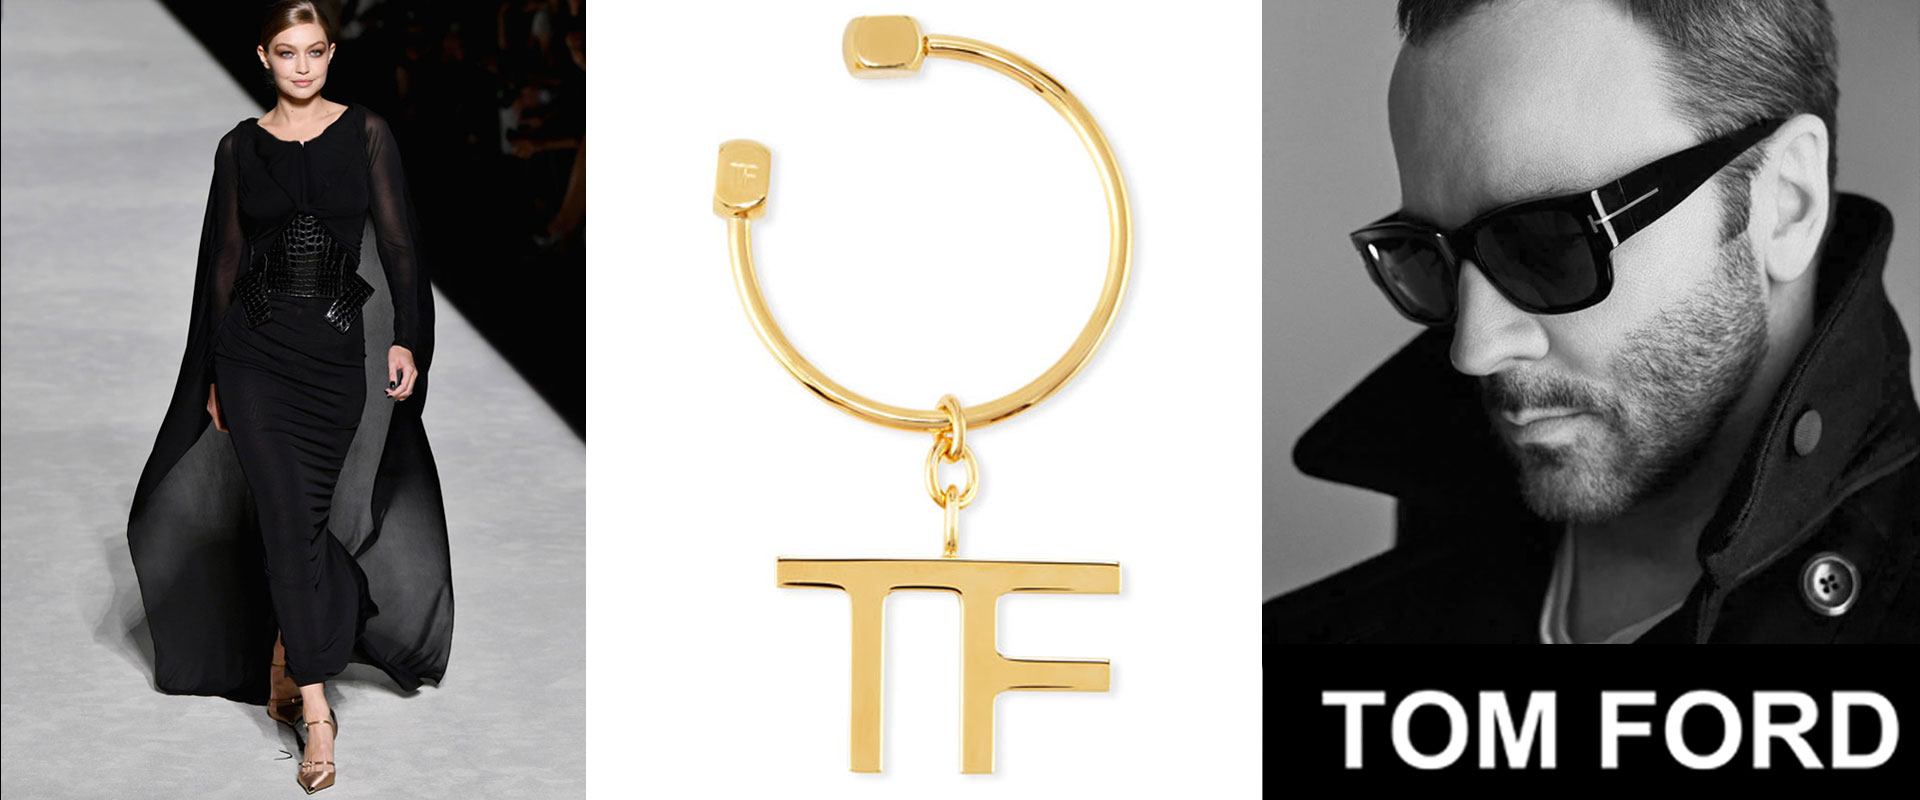 TomFord 4 1 - تام فورد Tom Ford